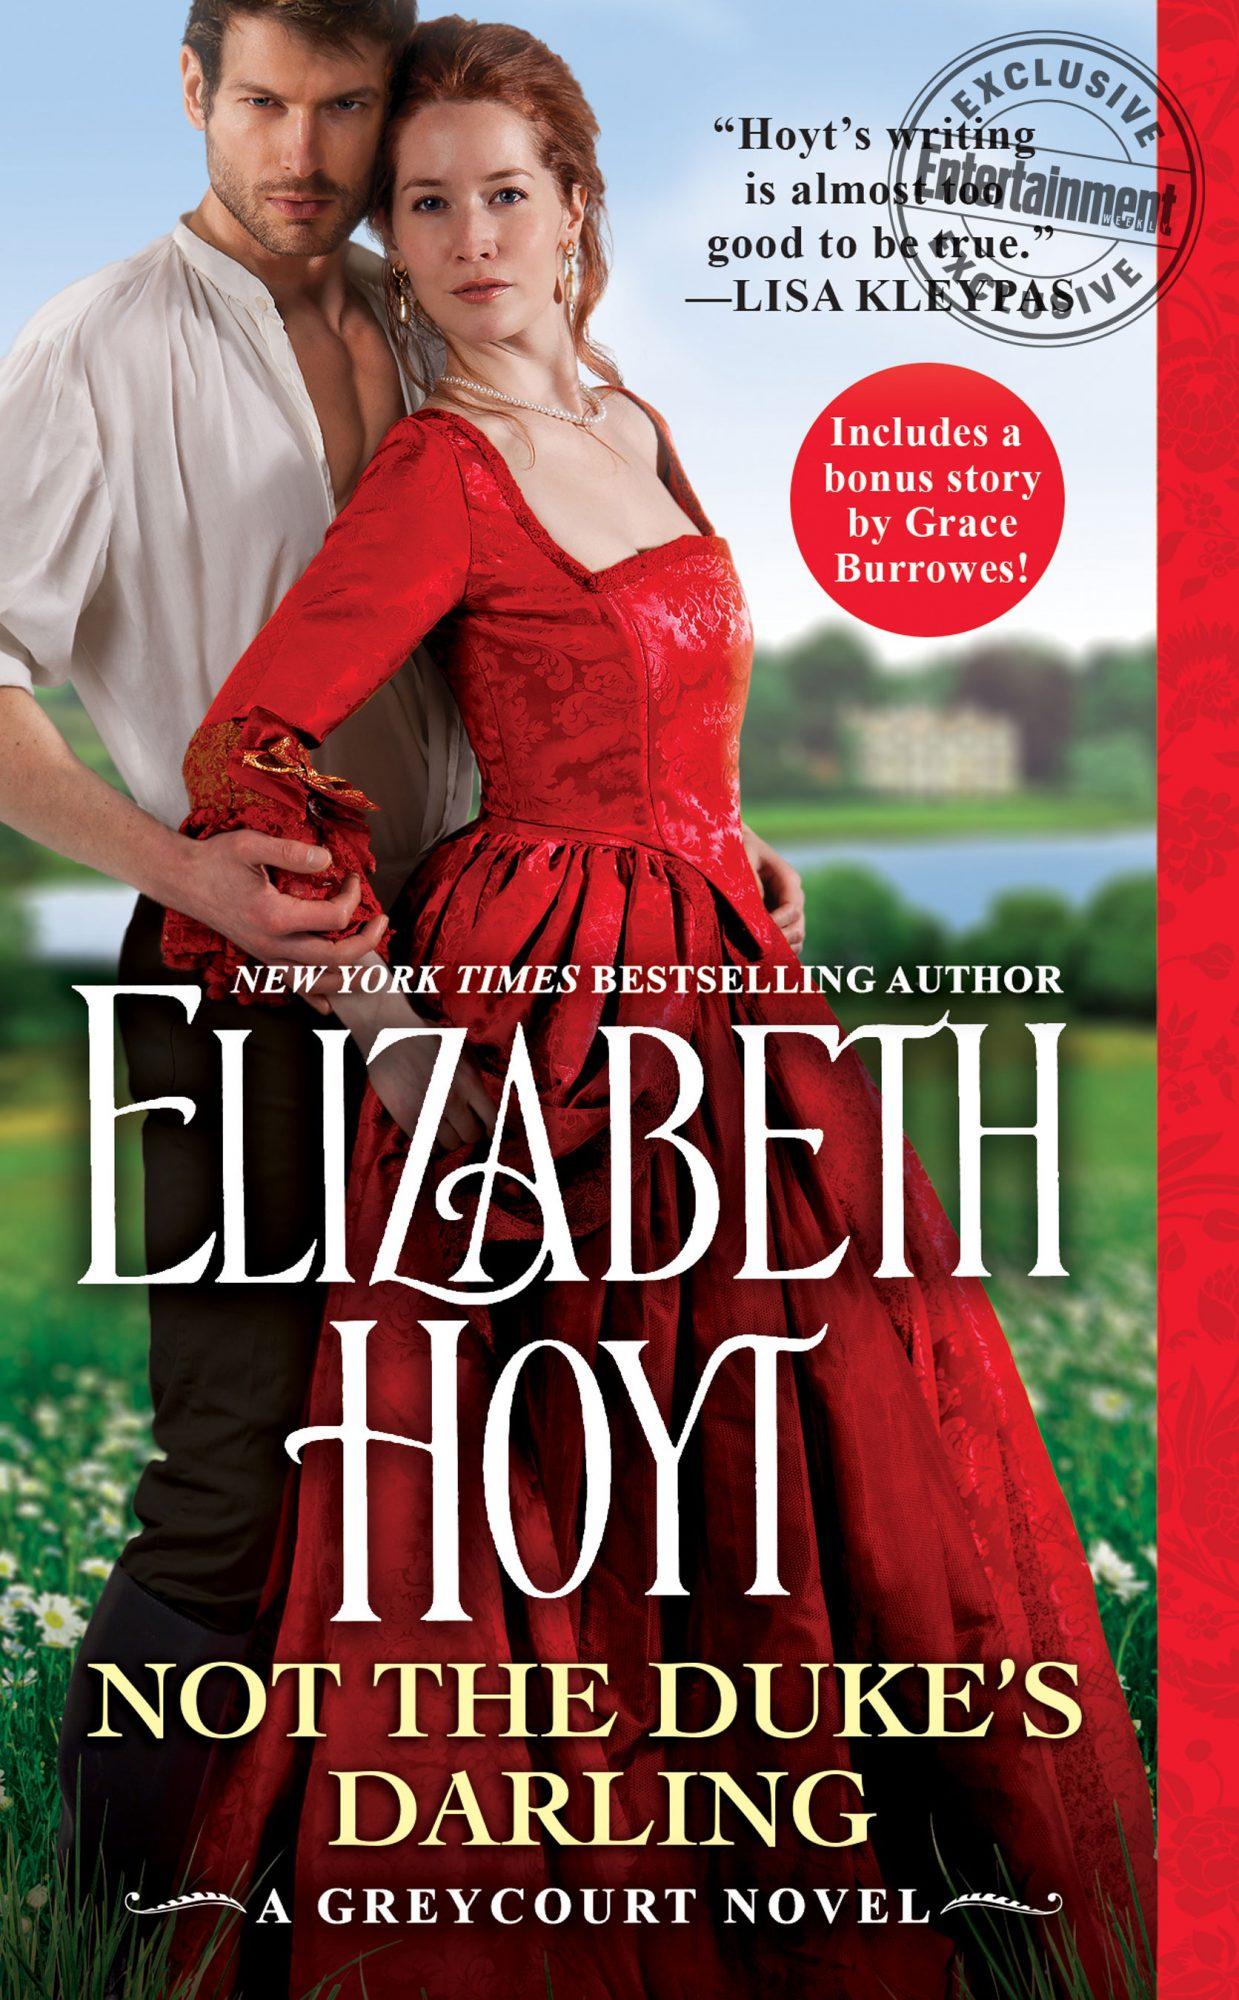 Elizabeth Hoyt Not The Duke's DarlingCredit: Grand Central Publishing